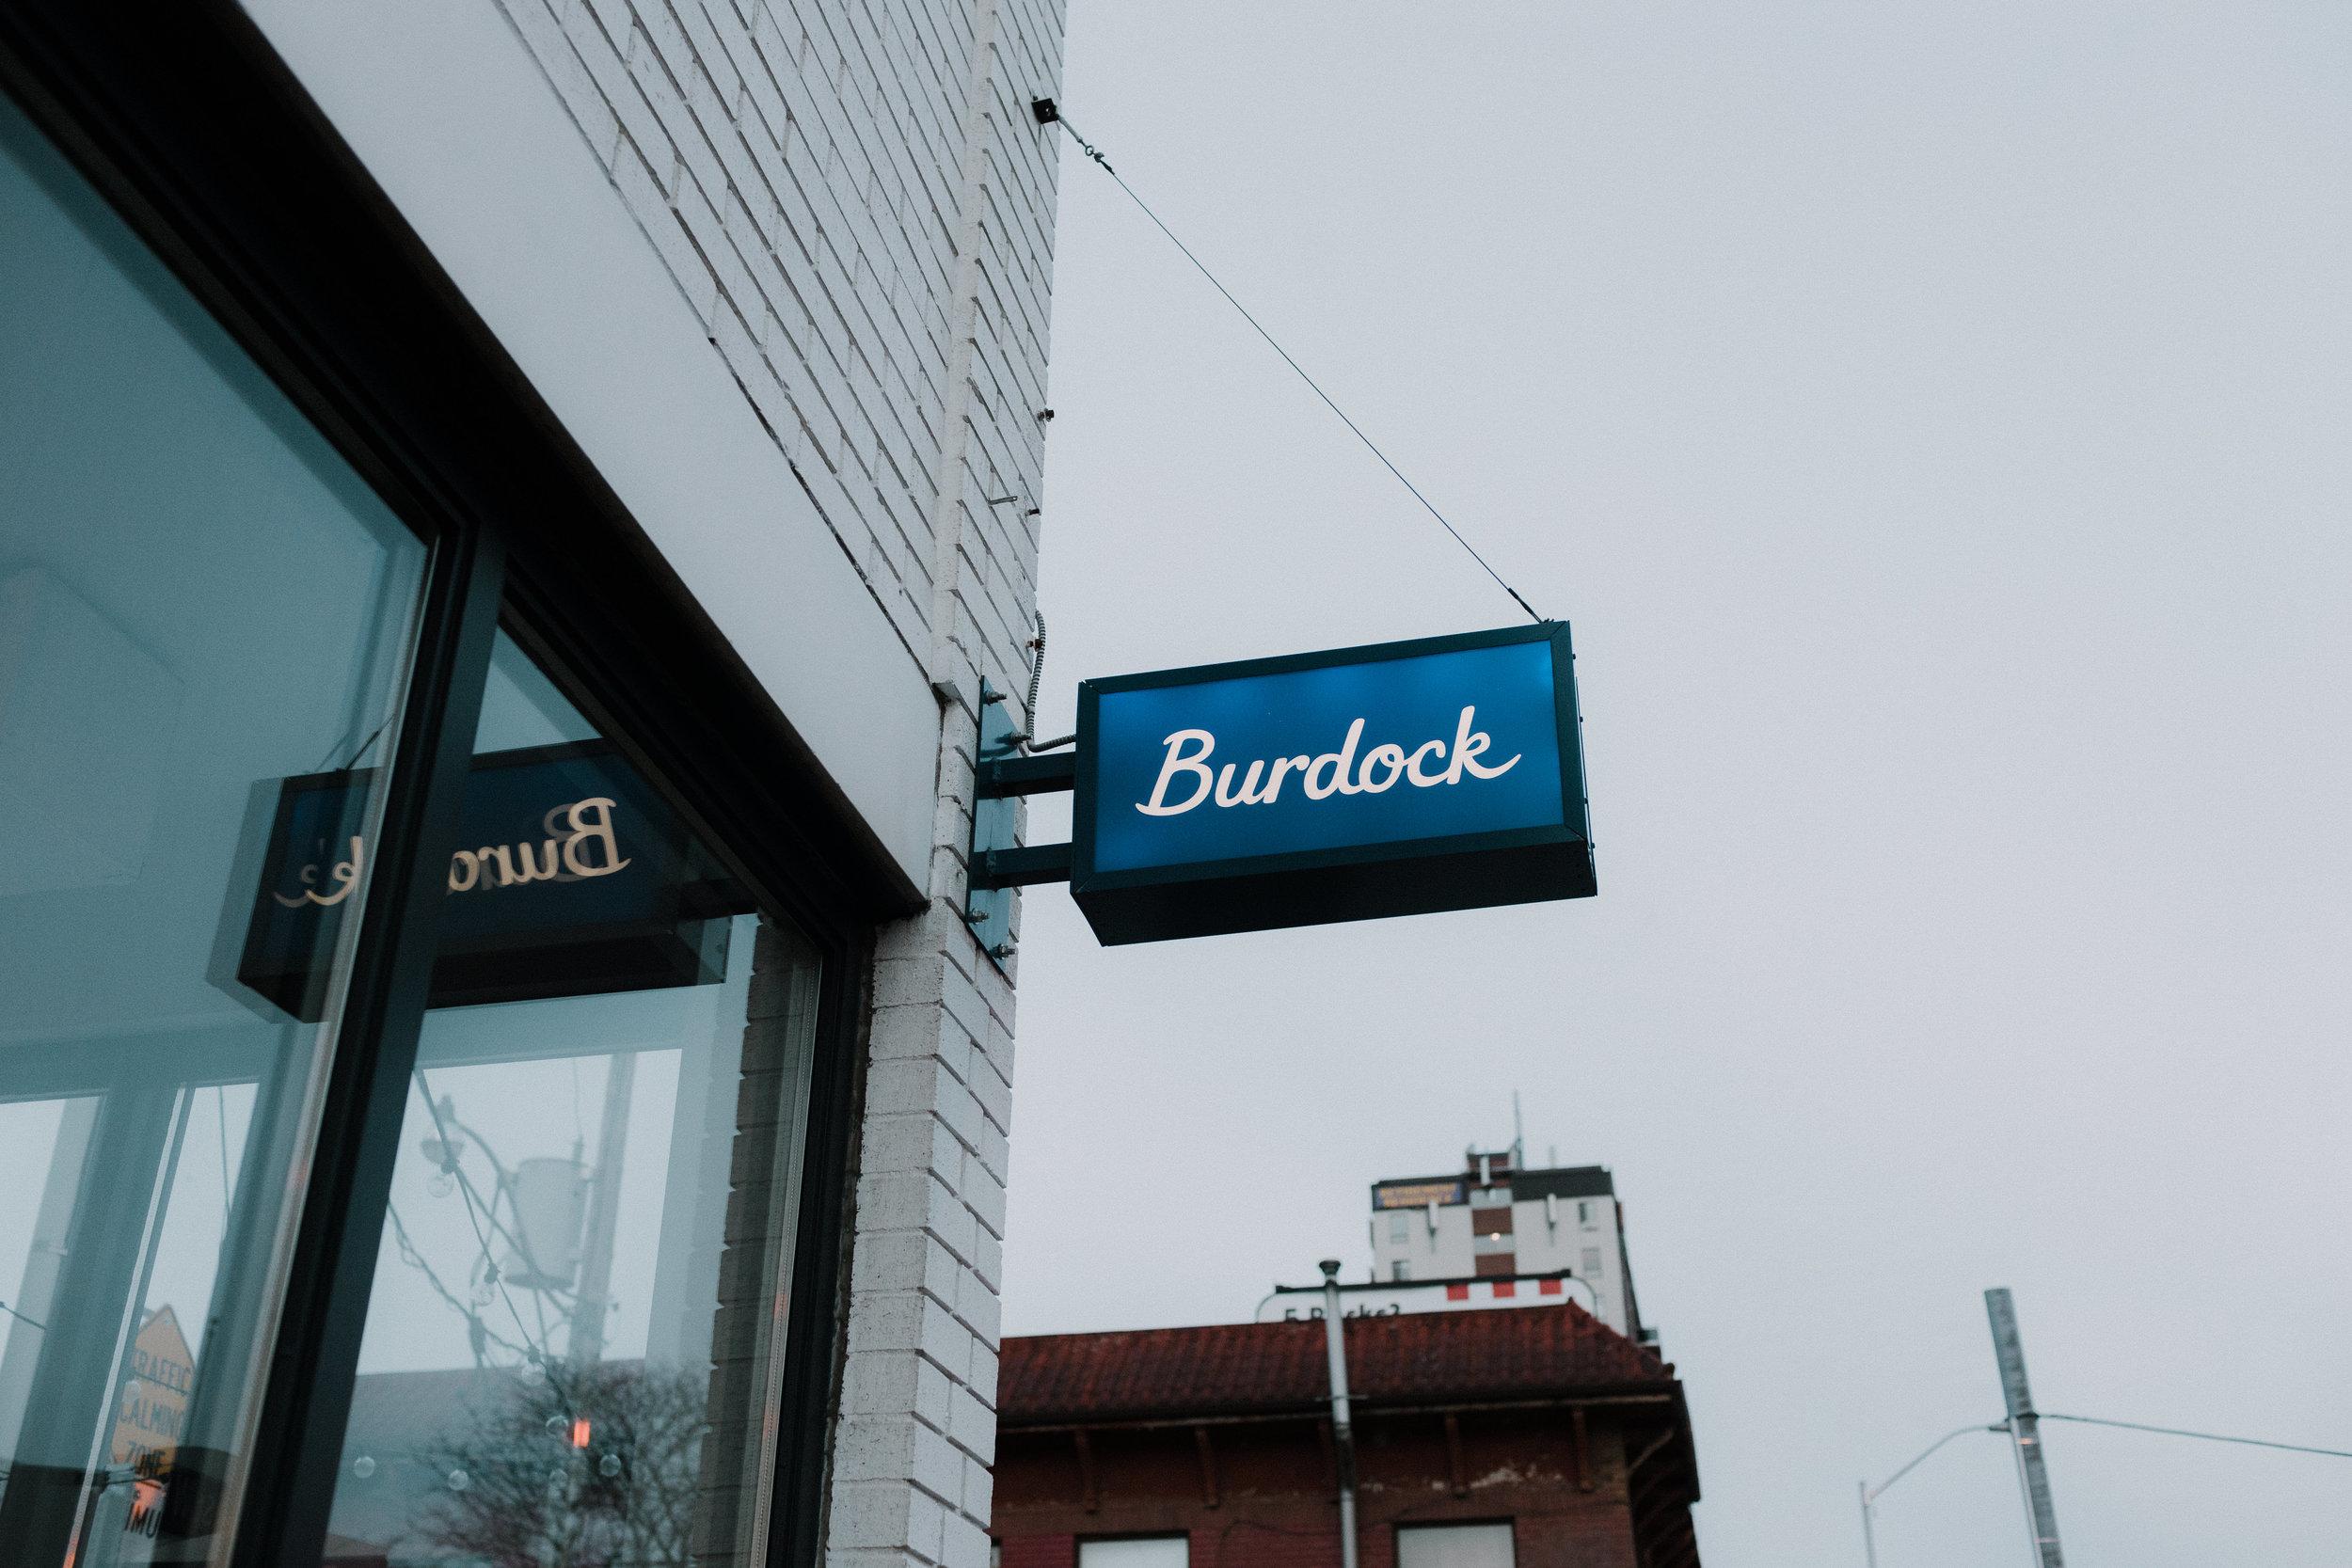 The Burdock